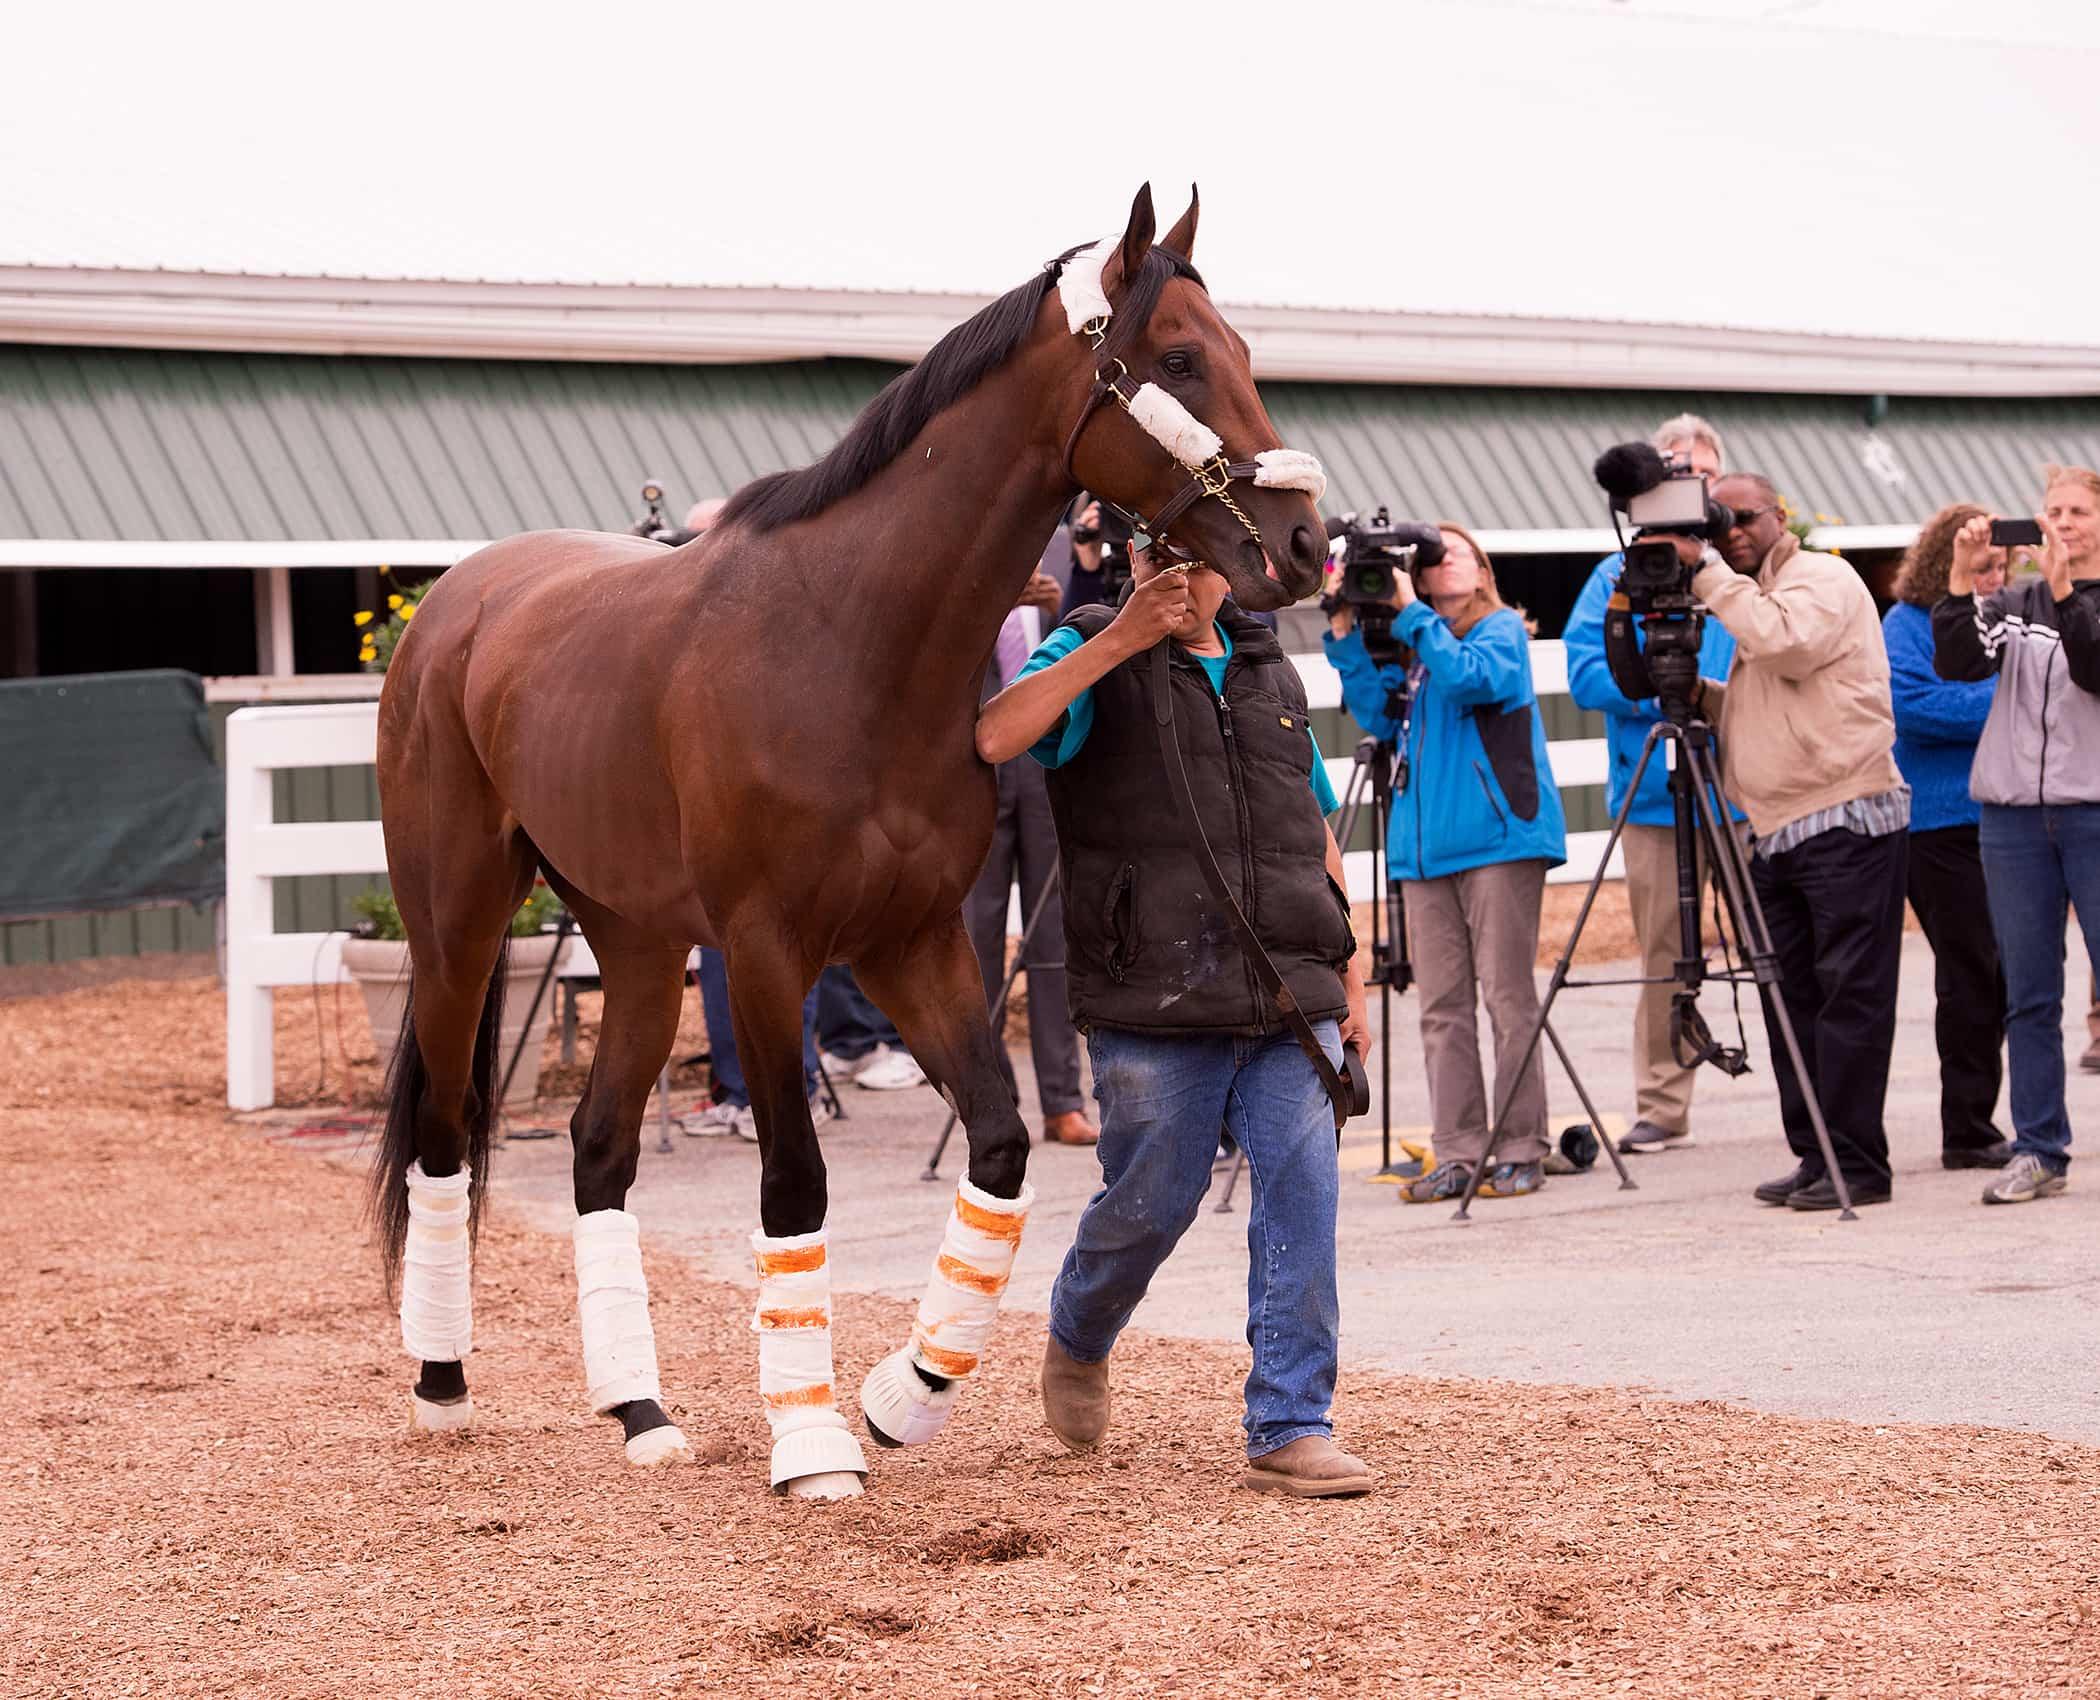 Nyquist 05arrive - Maryland Jockey Club Photo